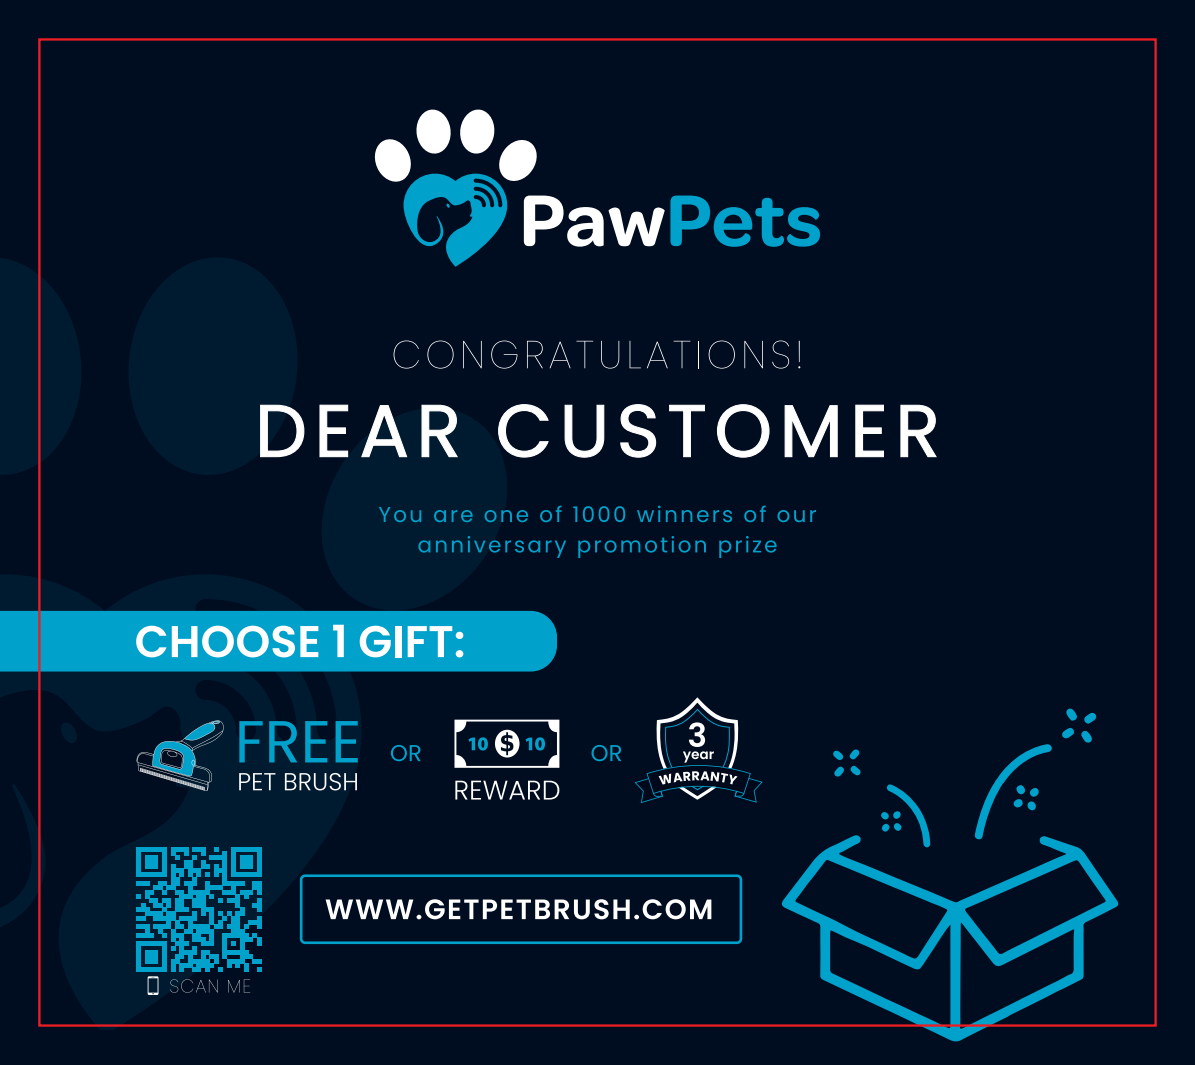 PawPets new insert